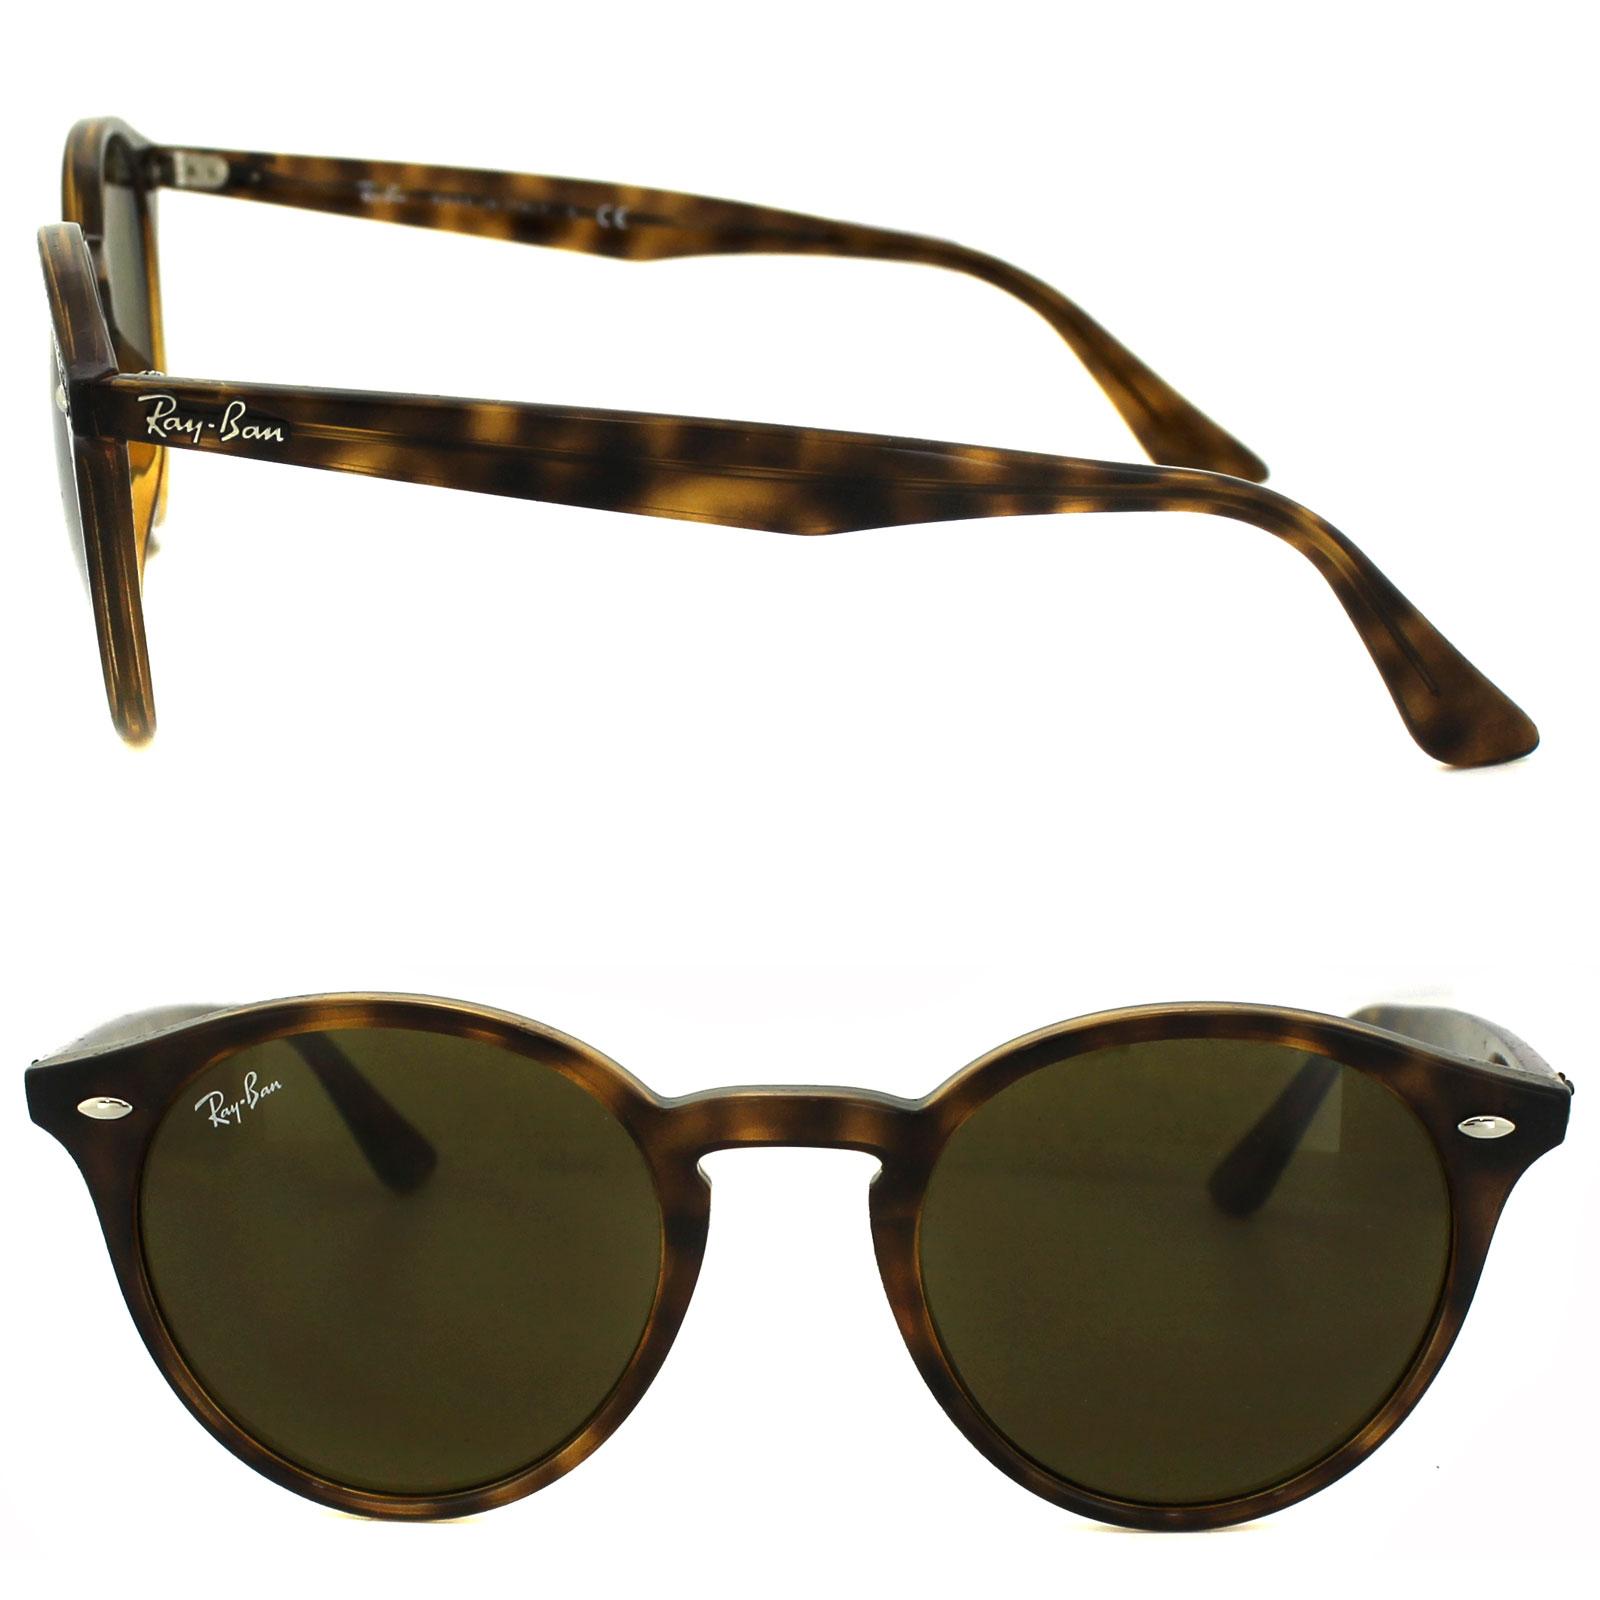 212101e2e0 Ray-Ban Sunglasses 2180 710 73 Tortoise Brown B-15 8053672358612